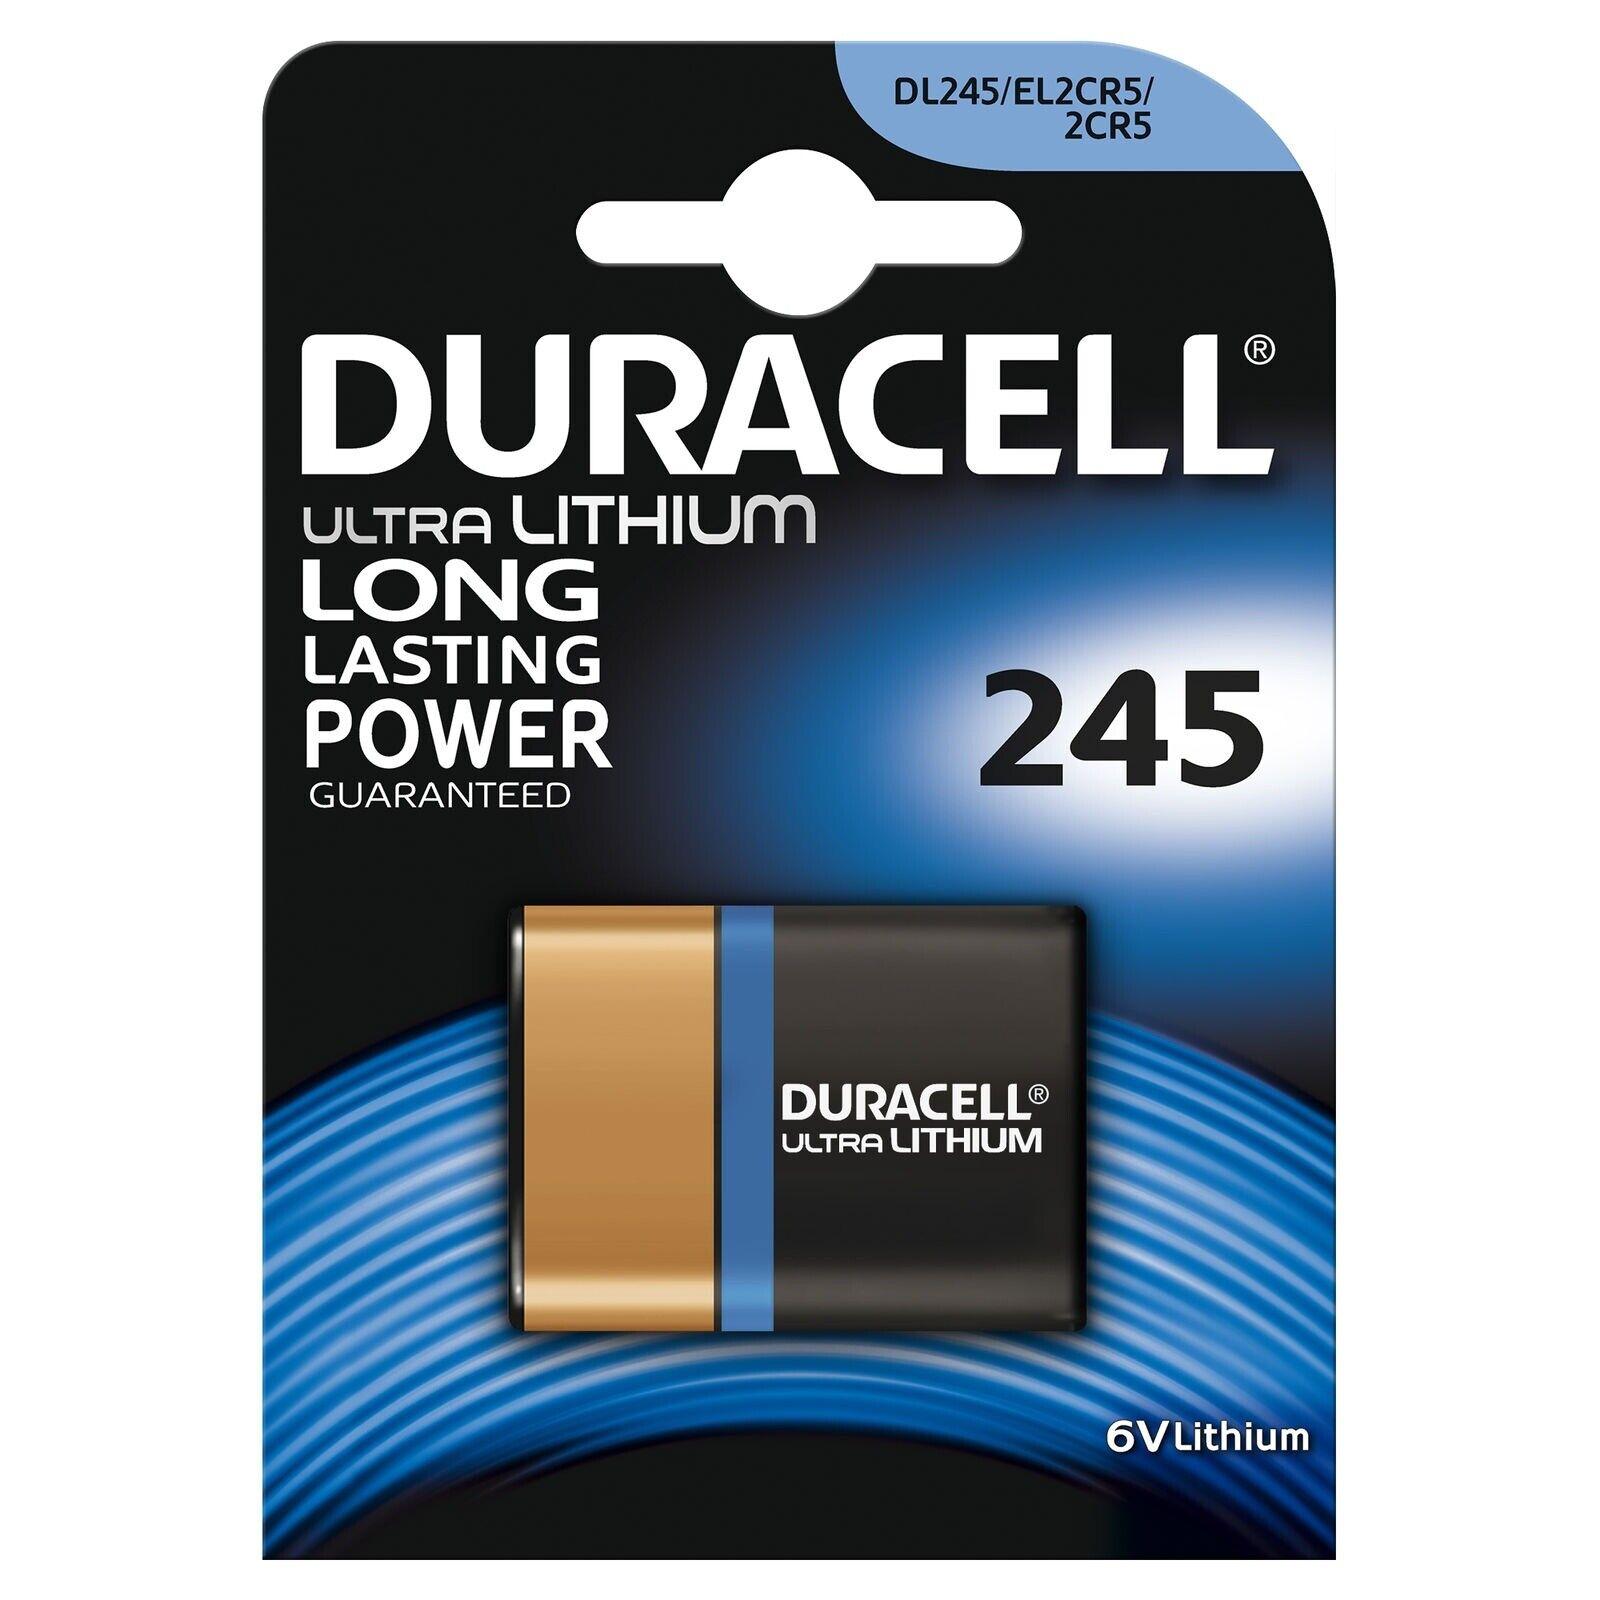 1 x Duracell 245 2CR5 6V Ultra Lithium Photo Battery CR245 DL245 EL2CR5